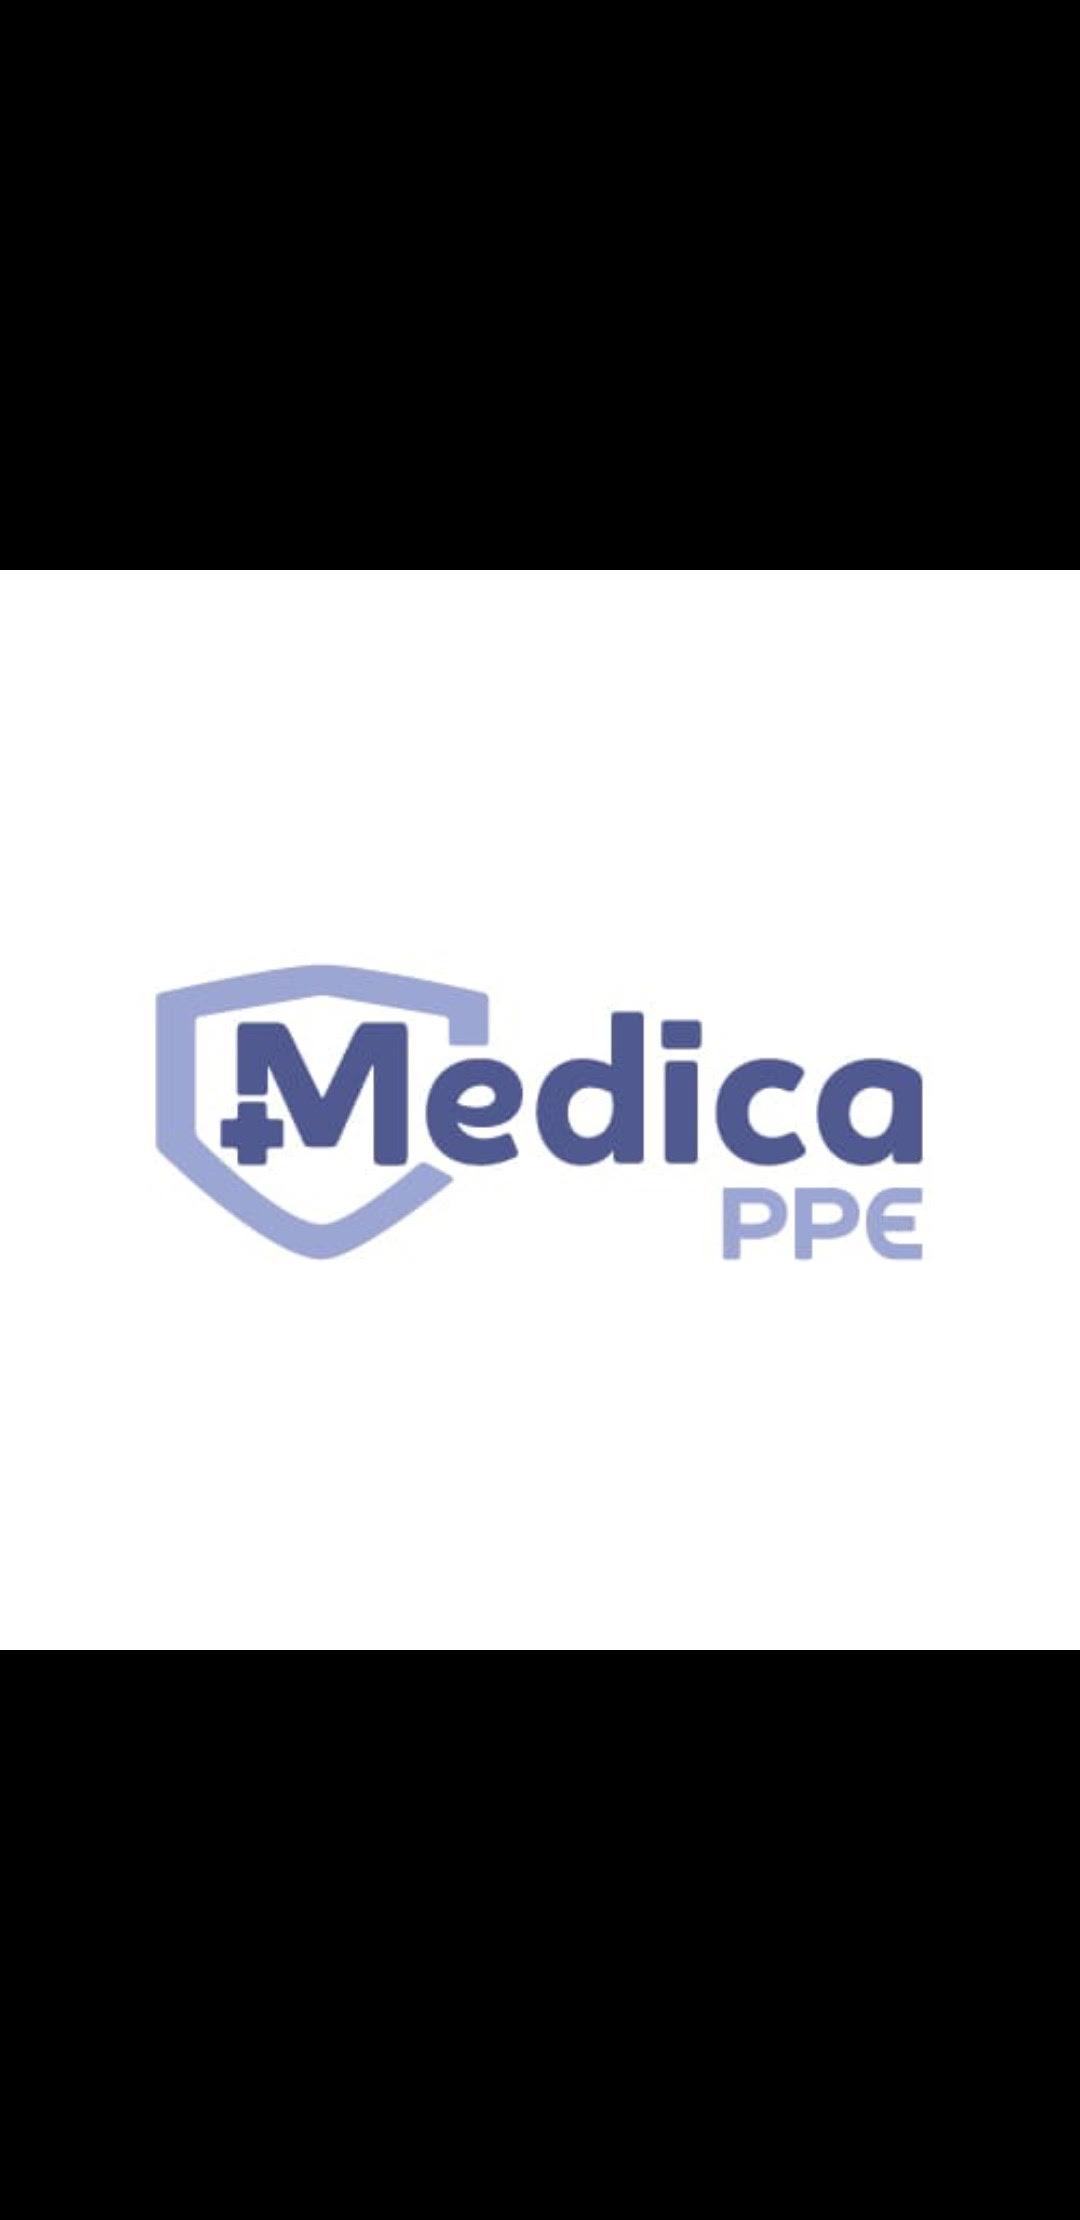 Medica PPE